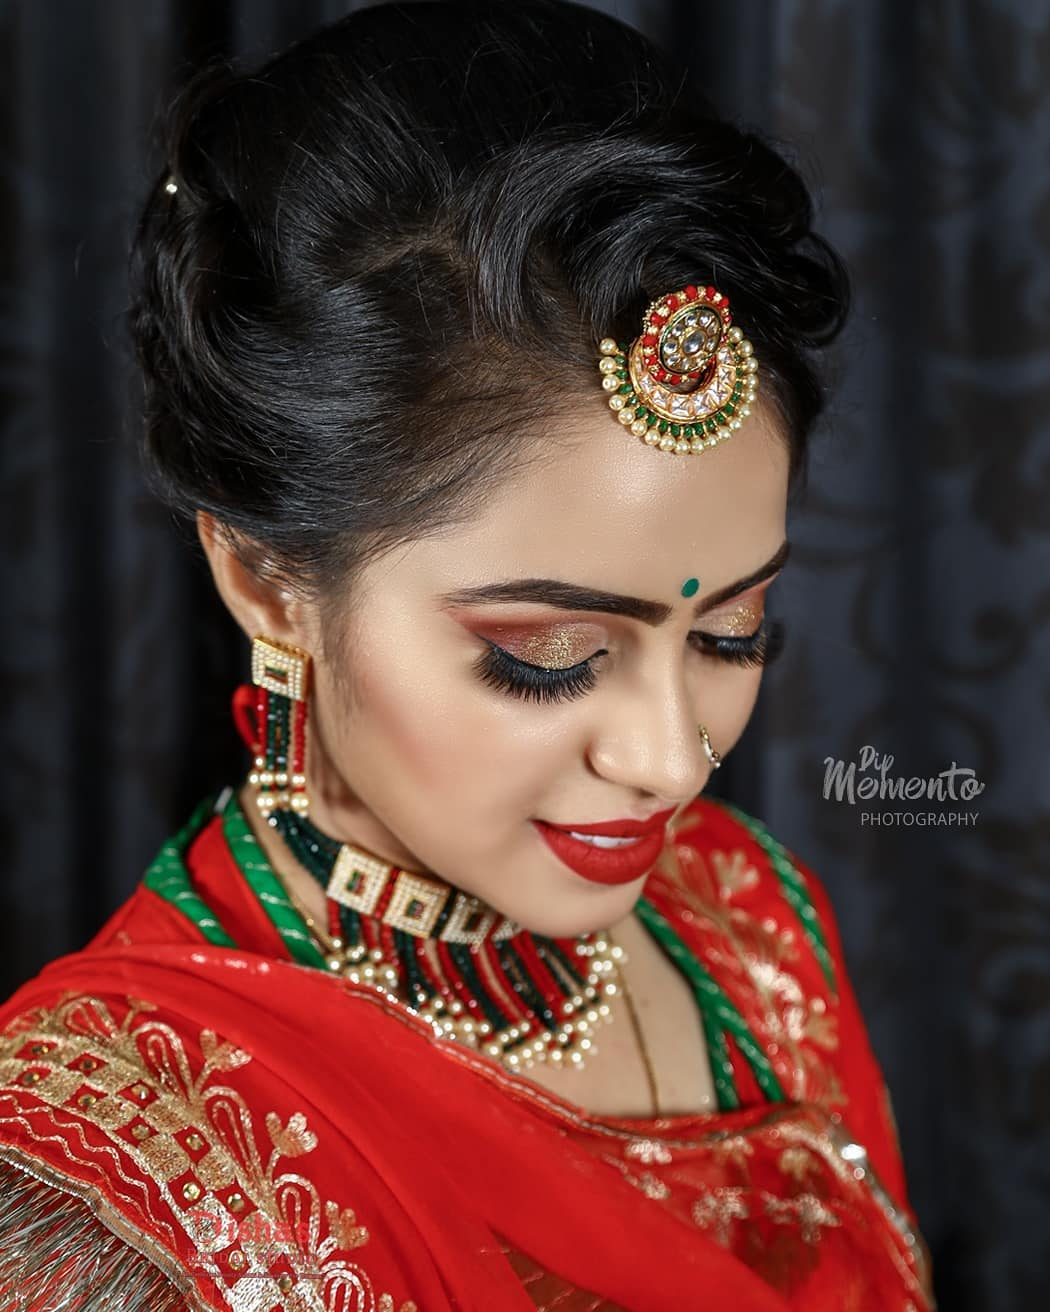 Makeup is powerful way to effectively  reveal something unique about your inner self.. . Marwadi Bride . . 📸@dip_memento_photography 💄@dishasbridalstudio . .  #brides #marwadibride #bridetobe #coolbrides #bigfatindianwedding #bridemakeup #indianwedding #photography #weddings #indianwedding #101 #dipmementophotography #9924227745 #loveformakeup #marwari #makeupartist #makeup #ahmedabad #candidportraits #indianbride #indianfashionblogger #marwadistyle #rajasthanibride #brides #funbrides . . @wedzo.in @indianstreetfashion @weddingz.in @indian_wedding_bliss @dulhaanddulhan @thebridesofindia @indianweddings @weddingdream @indianweddingbuzz @shaadisaga @zo_wed @desiclassybrides @weddingwireindia @indiagramwedding @shaadisaga @indian__wedding @thebridesofindia @weddingsutra @wedmegood @bridalaffairind @theweddingbrigade @weddingplz @weddingfables @indian_wedding_inspiration @eventilaindia @_punjabi_weddings